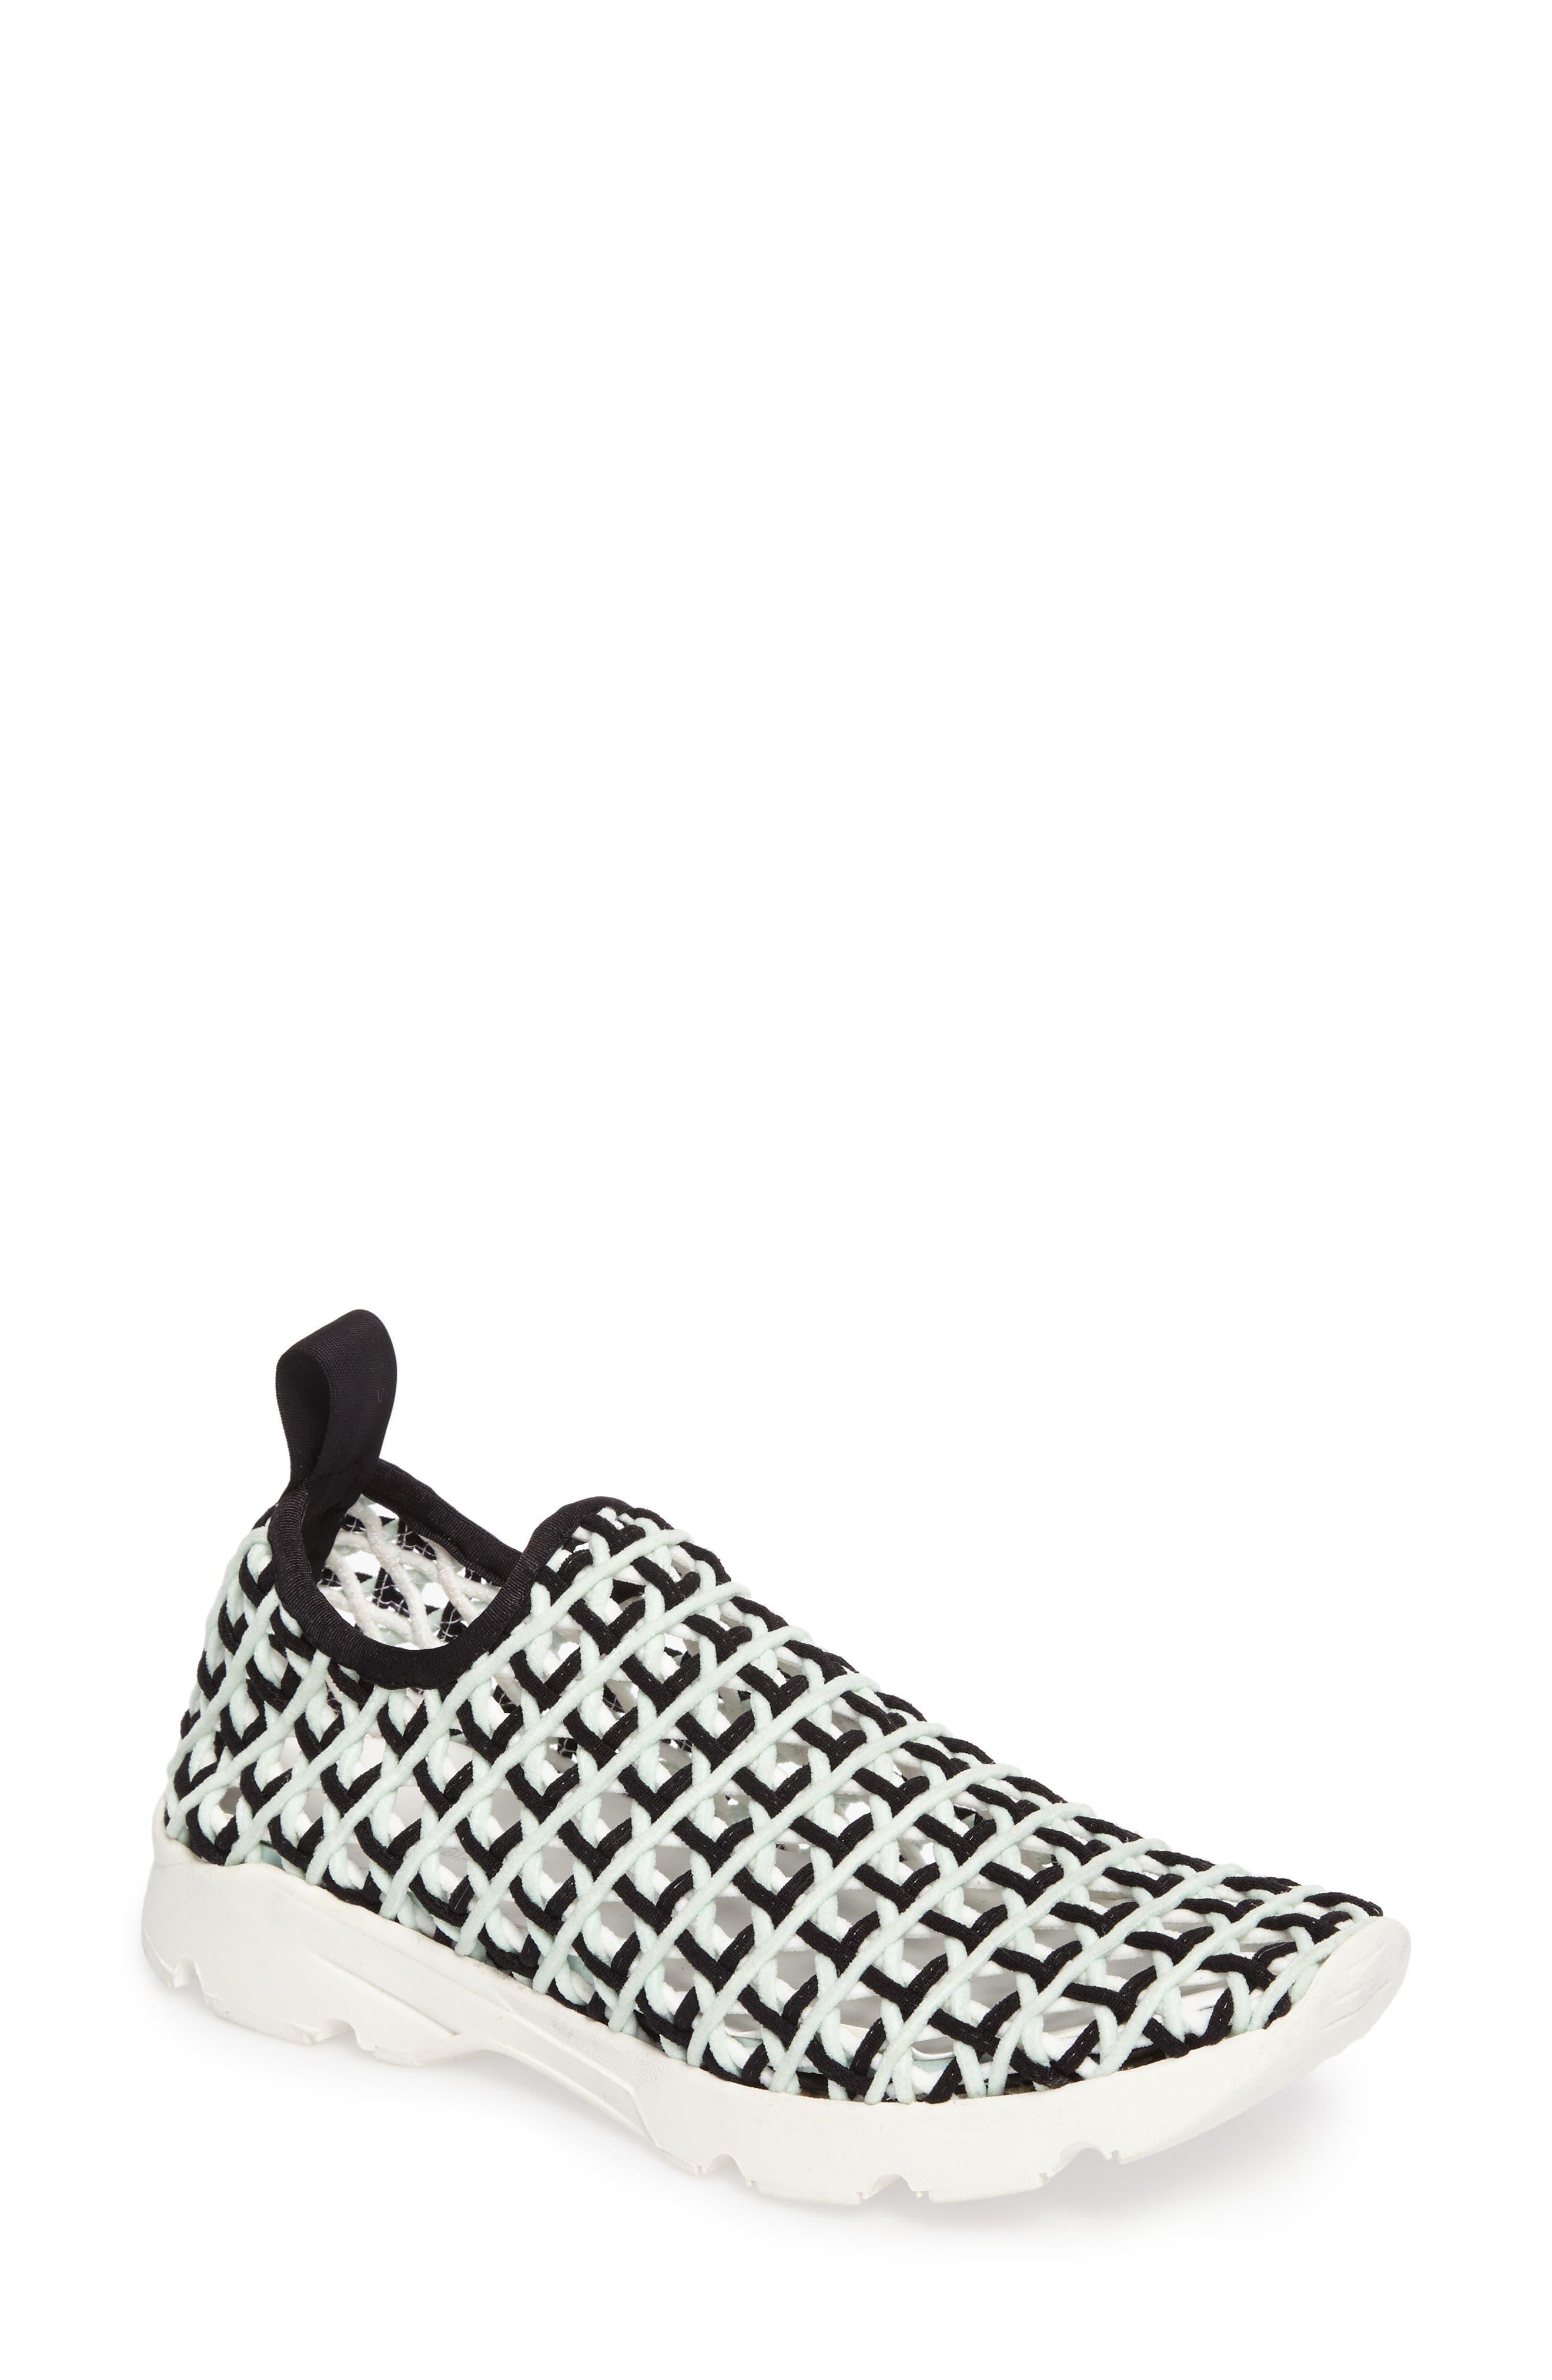 Alternate Image 1 Selected - Tony Bianco Willow Open Knit Sneaker (Women)